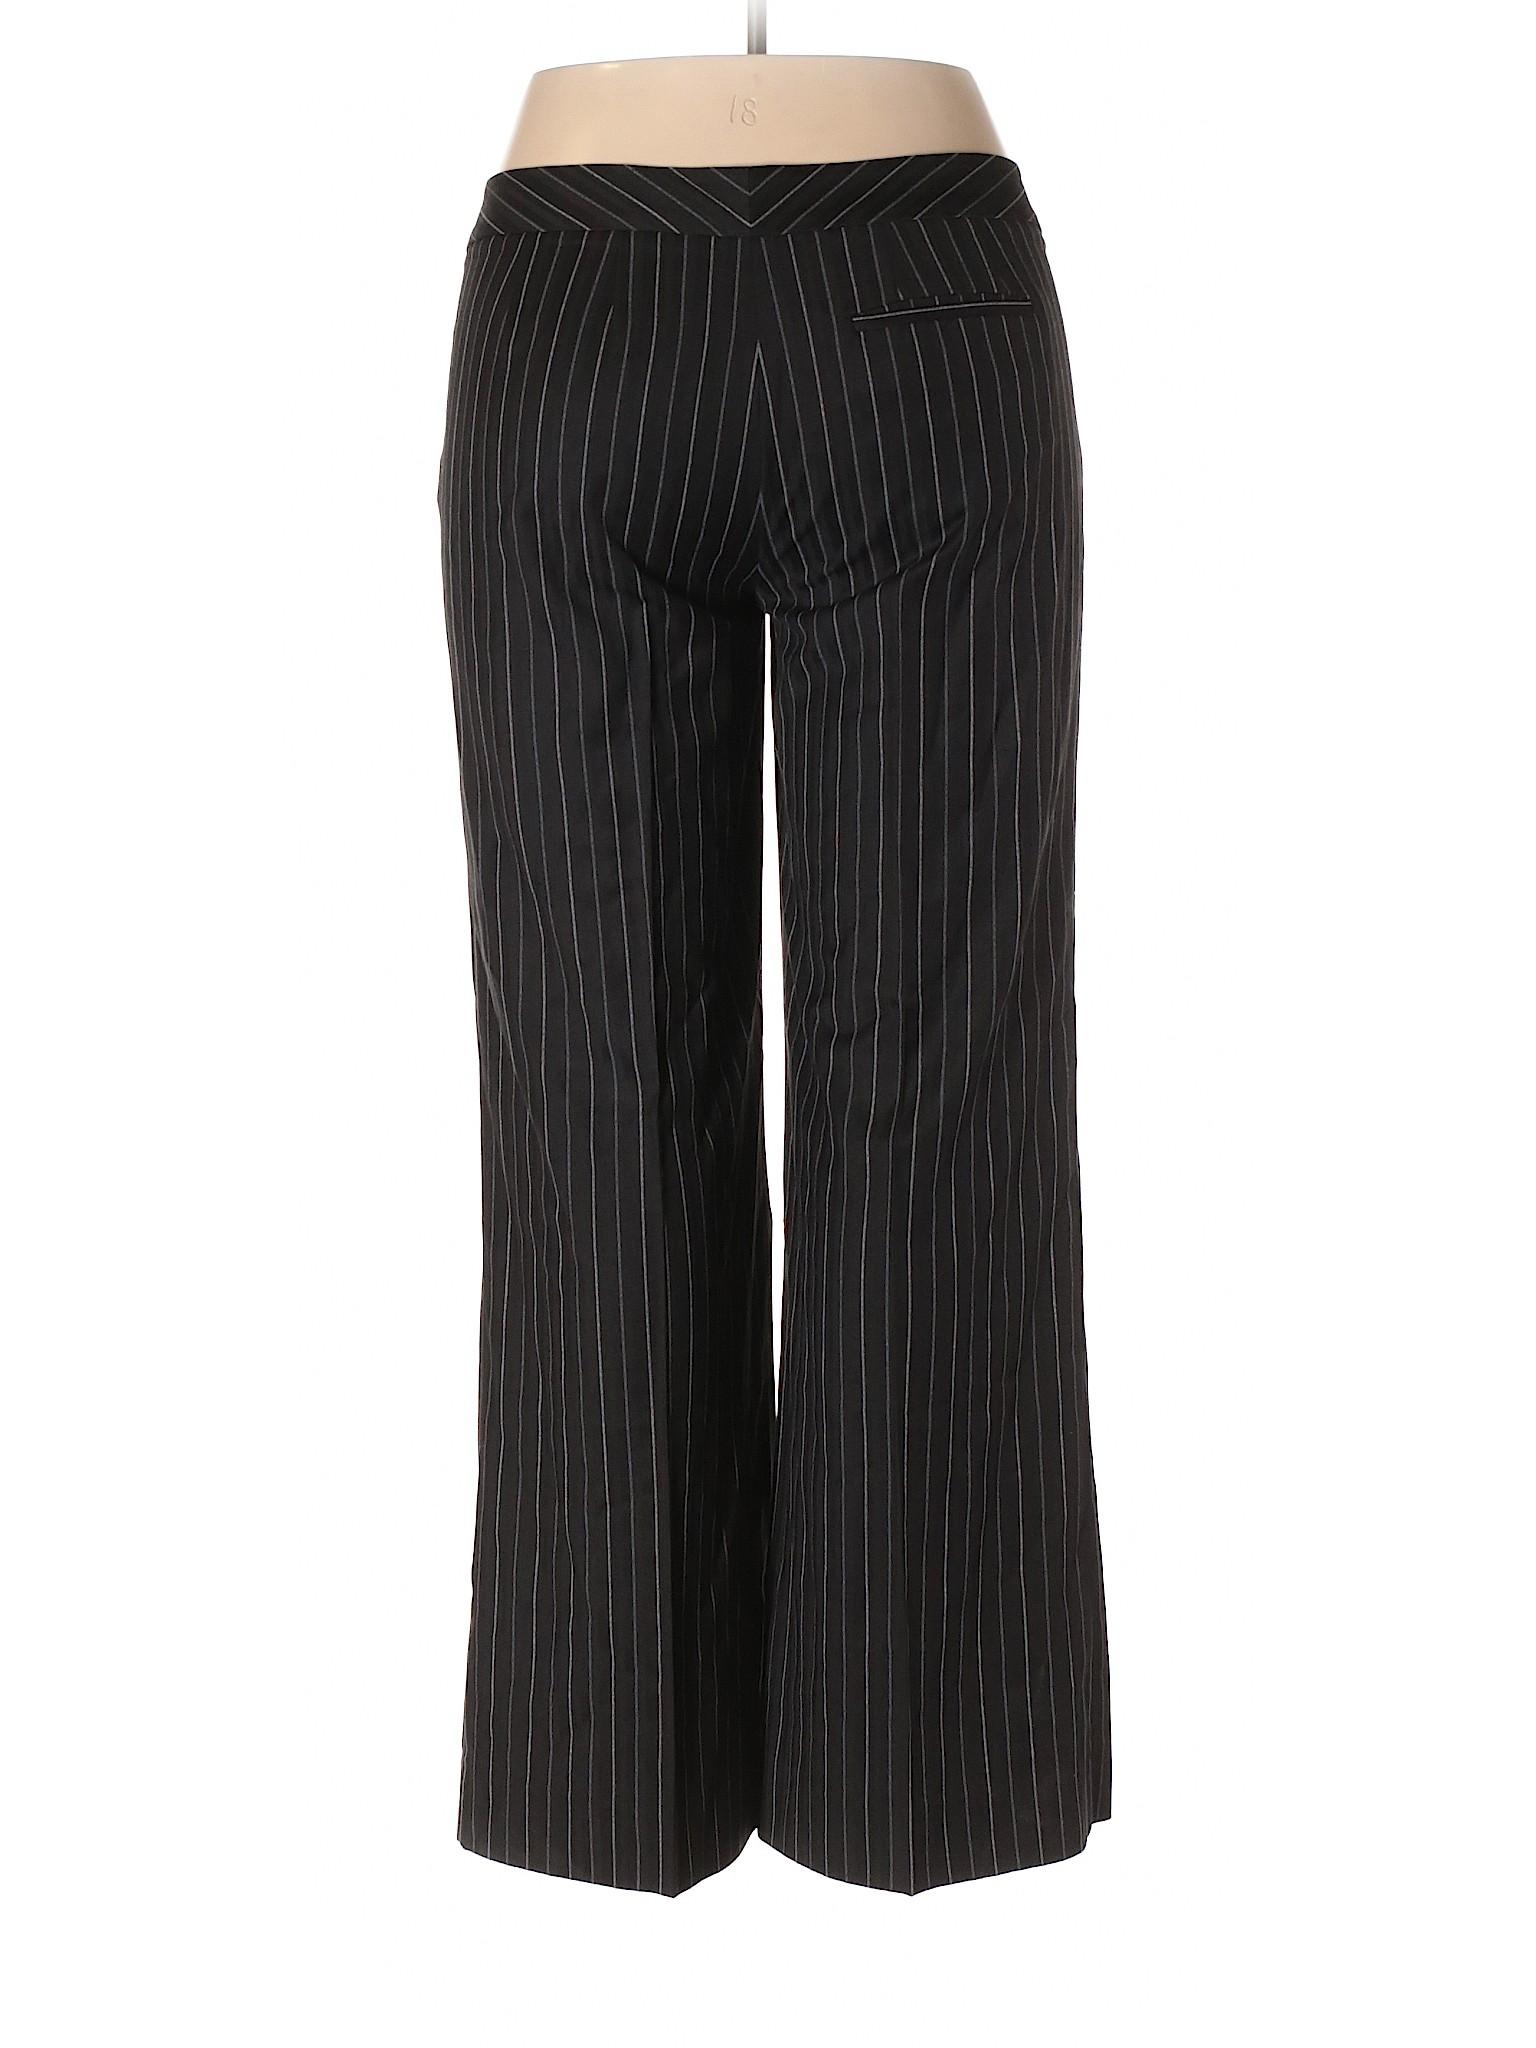 amp; Dress Jac winter Pants Boutique Mac qC4pWvEvw